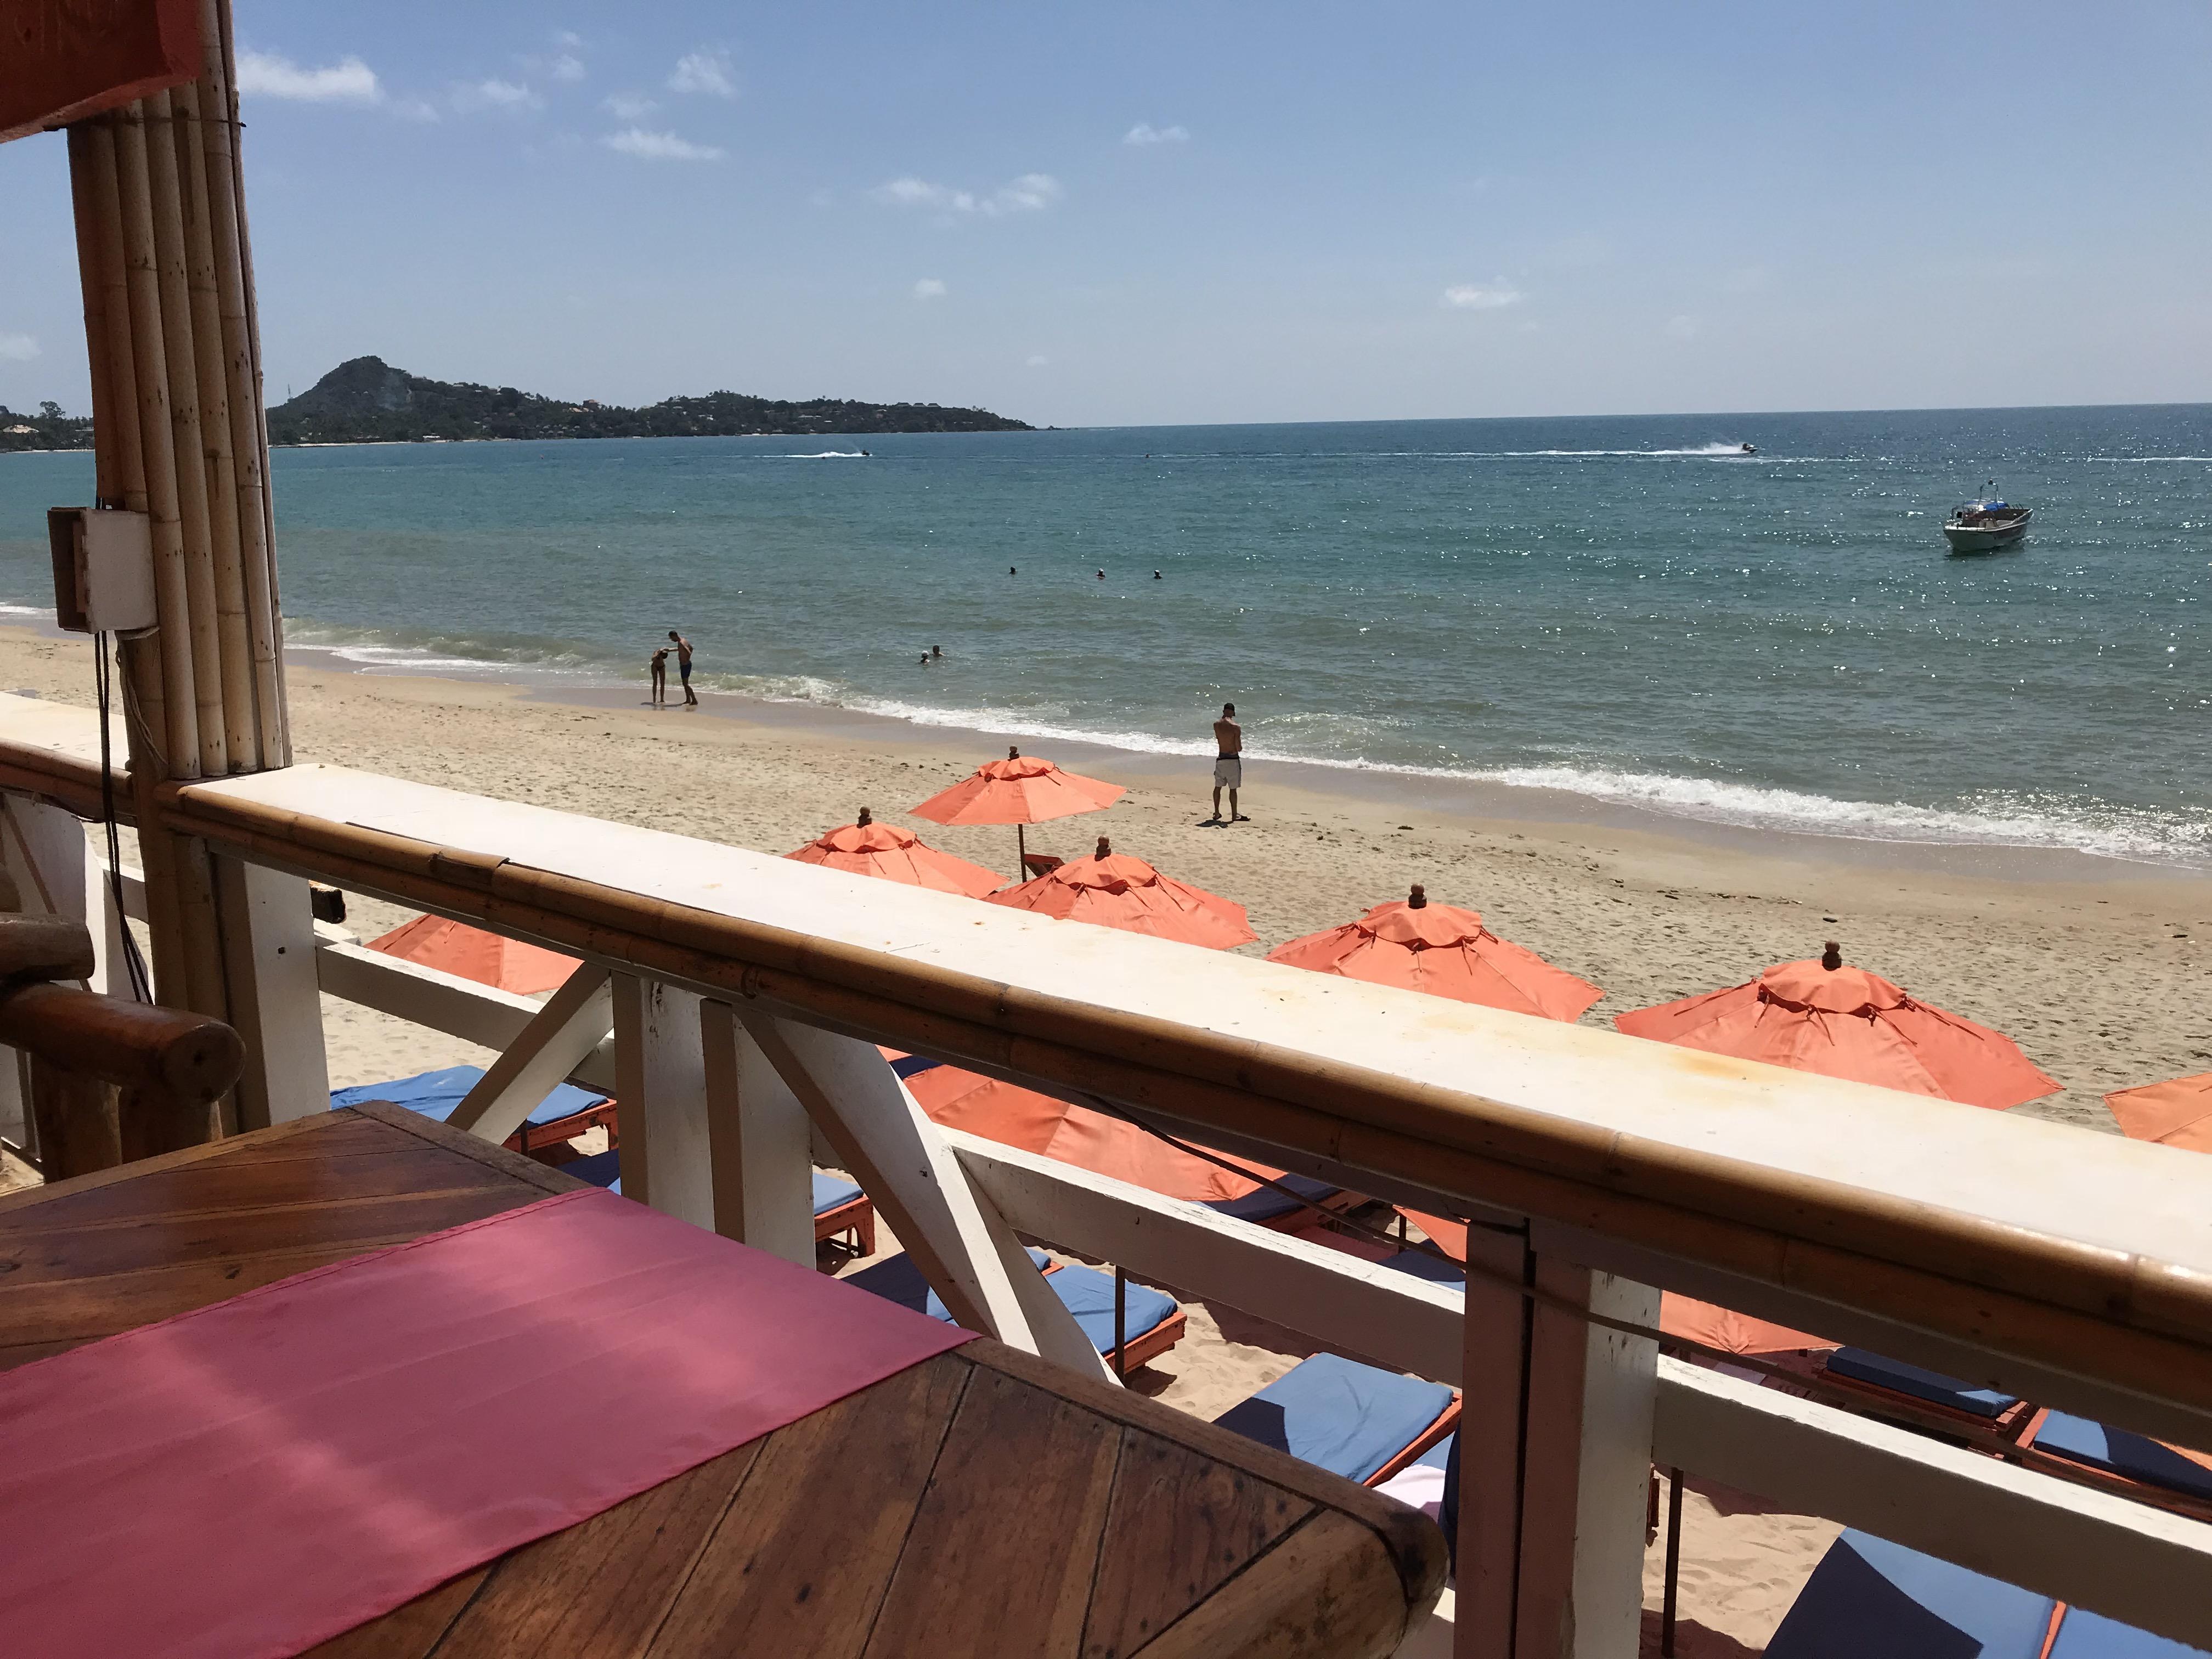 Rich resort beachside hotel